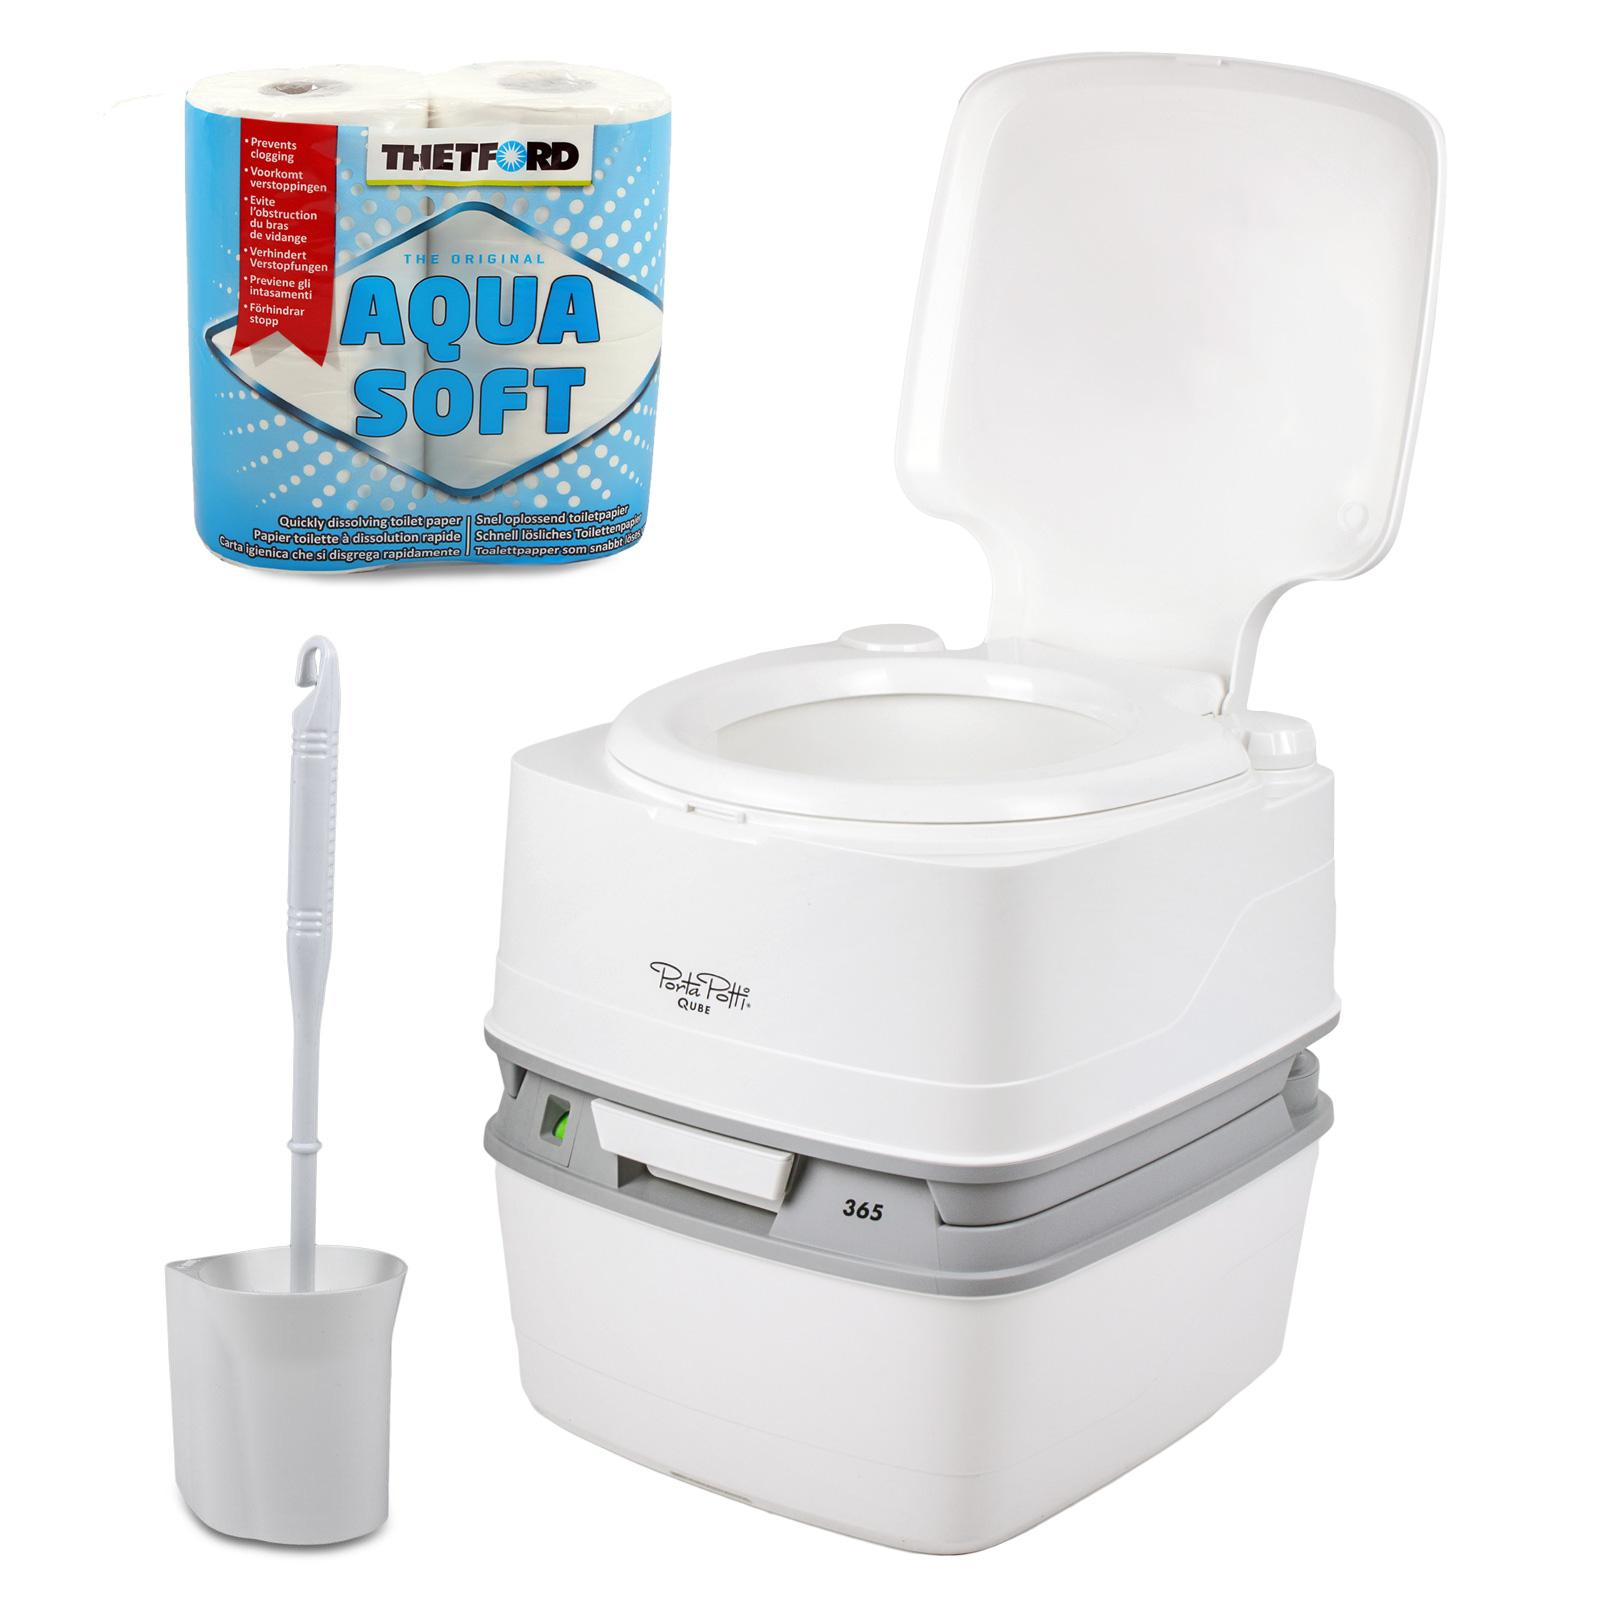 Porta Potti Qube 365 + Chemie + Fiamma Toilettenbürste + Aquasoft